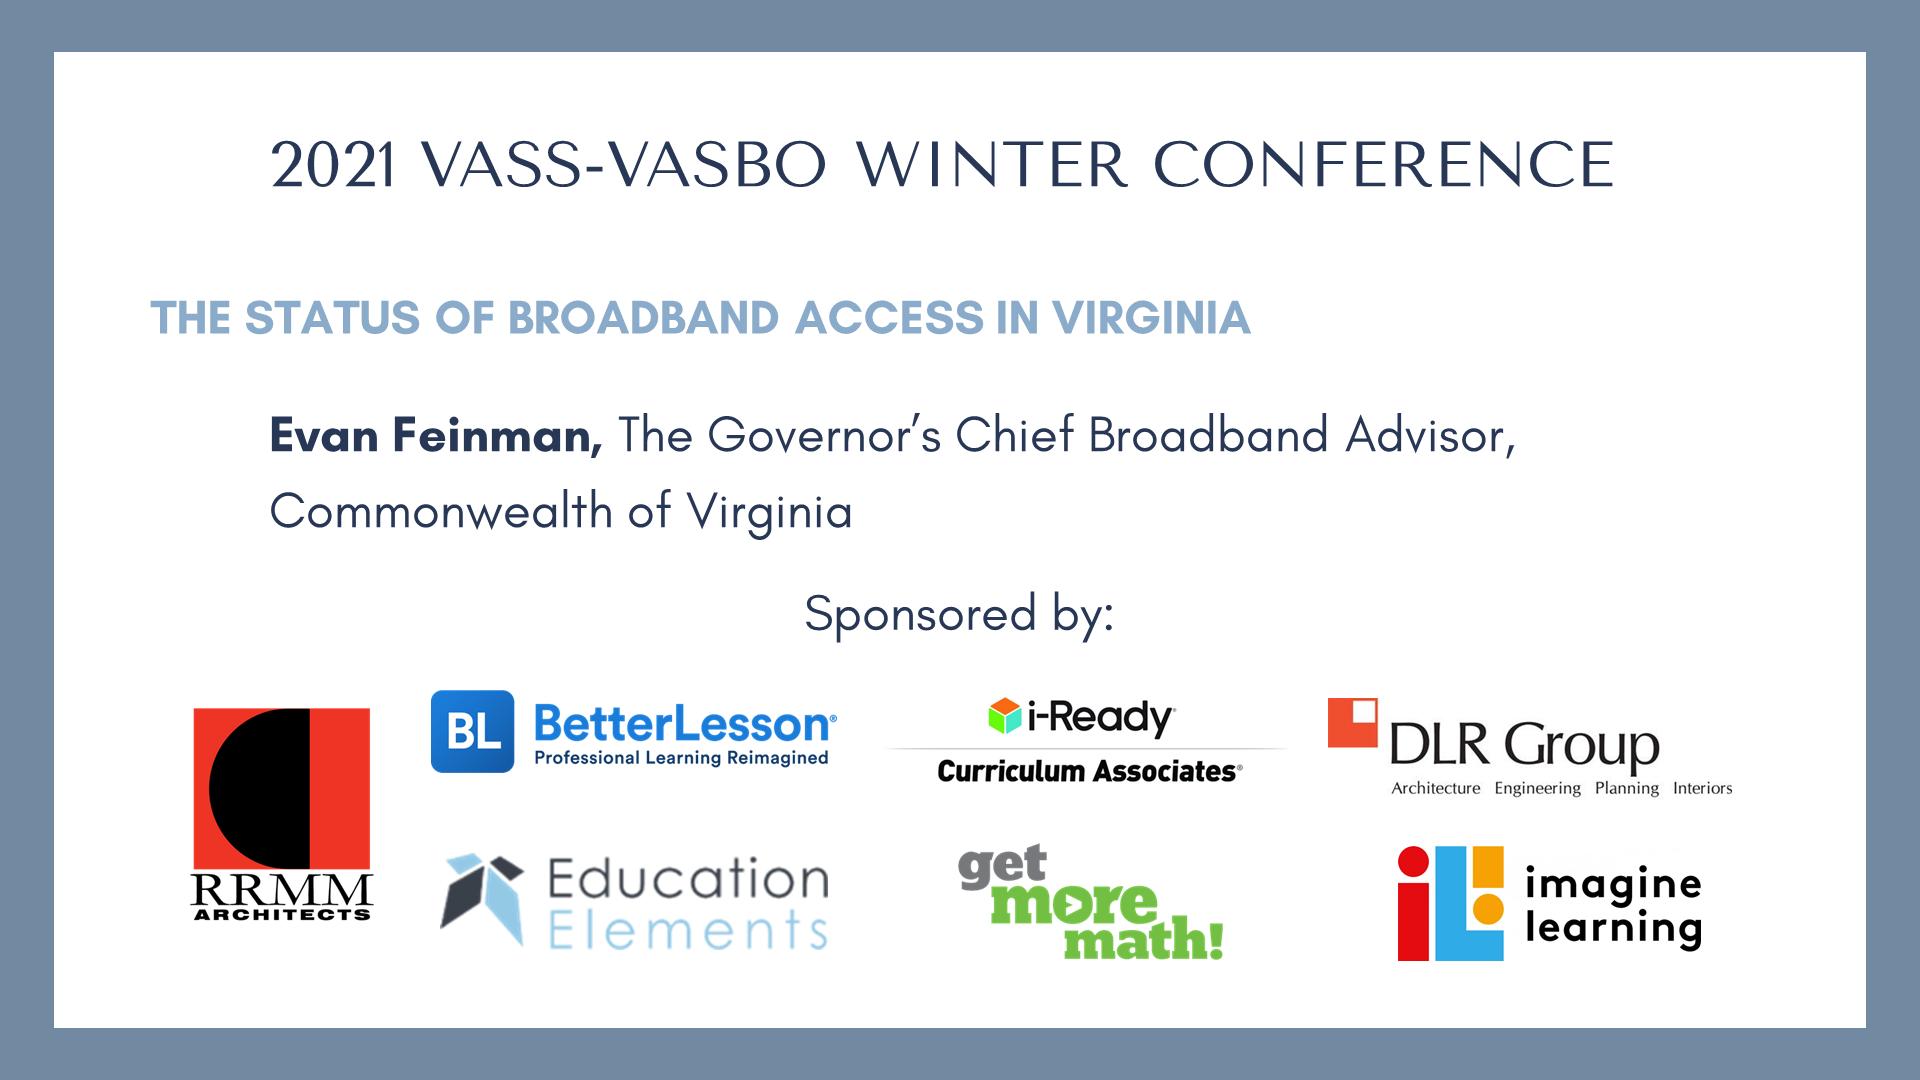 The Status of Broadband Access in Virginia